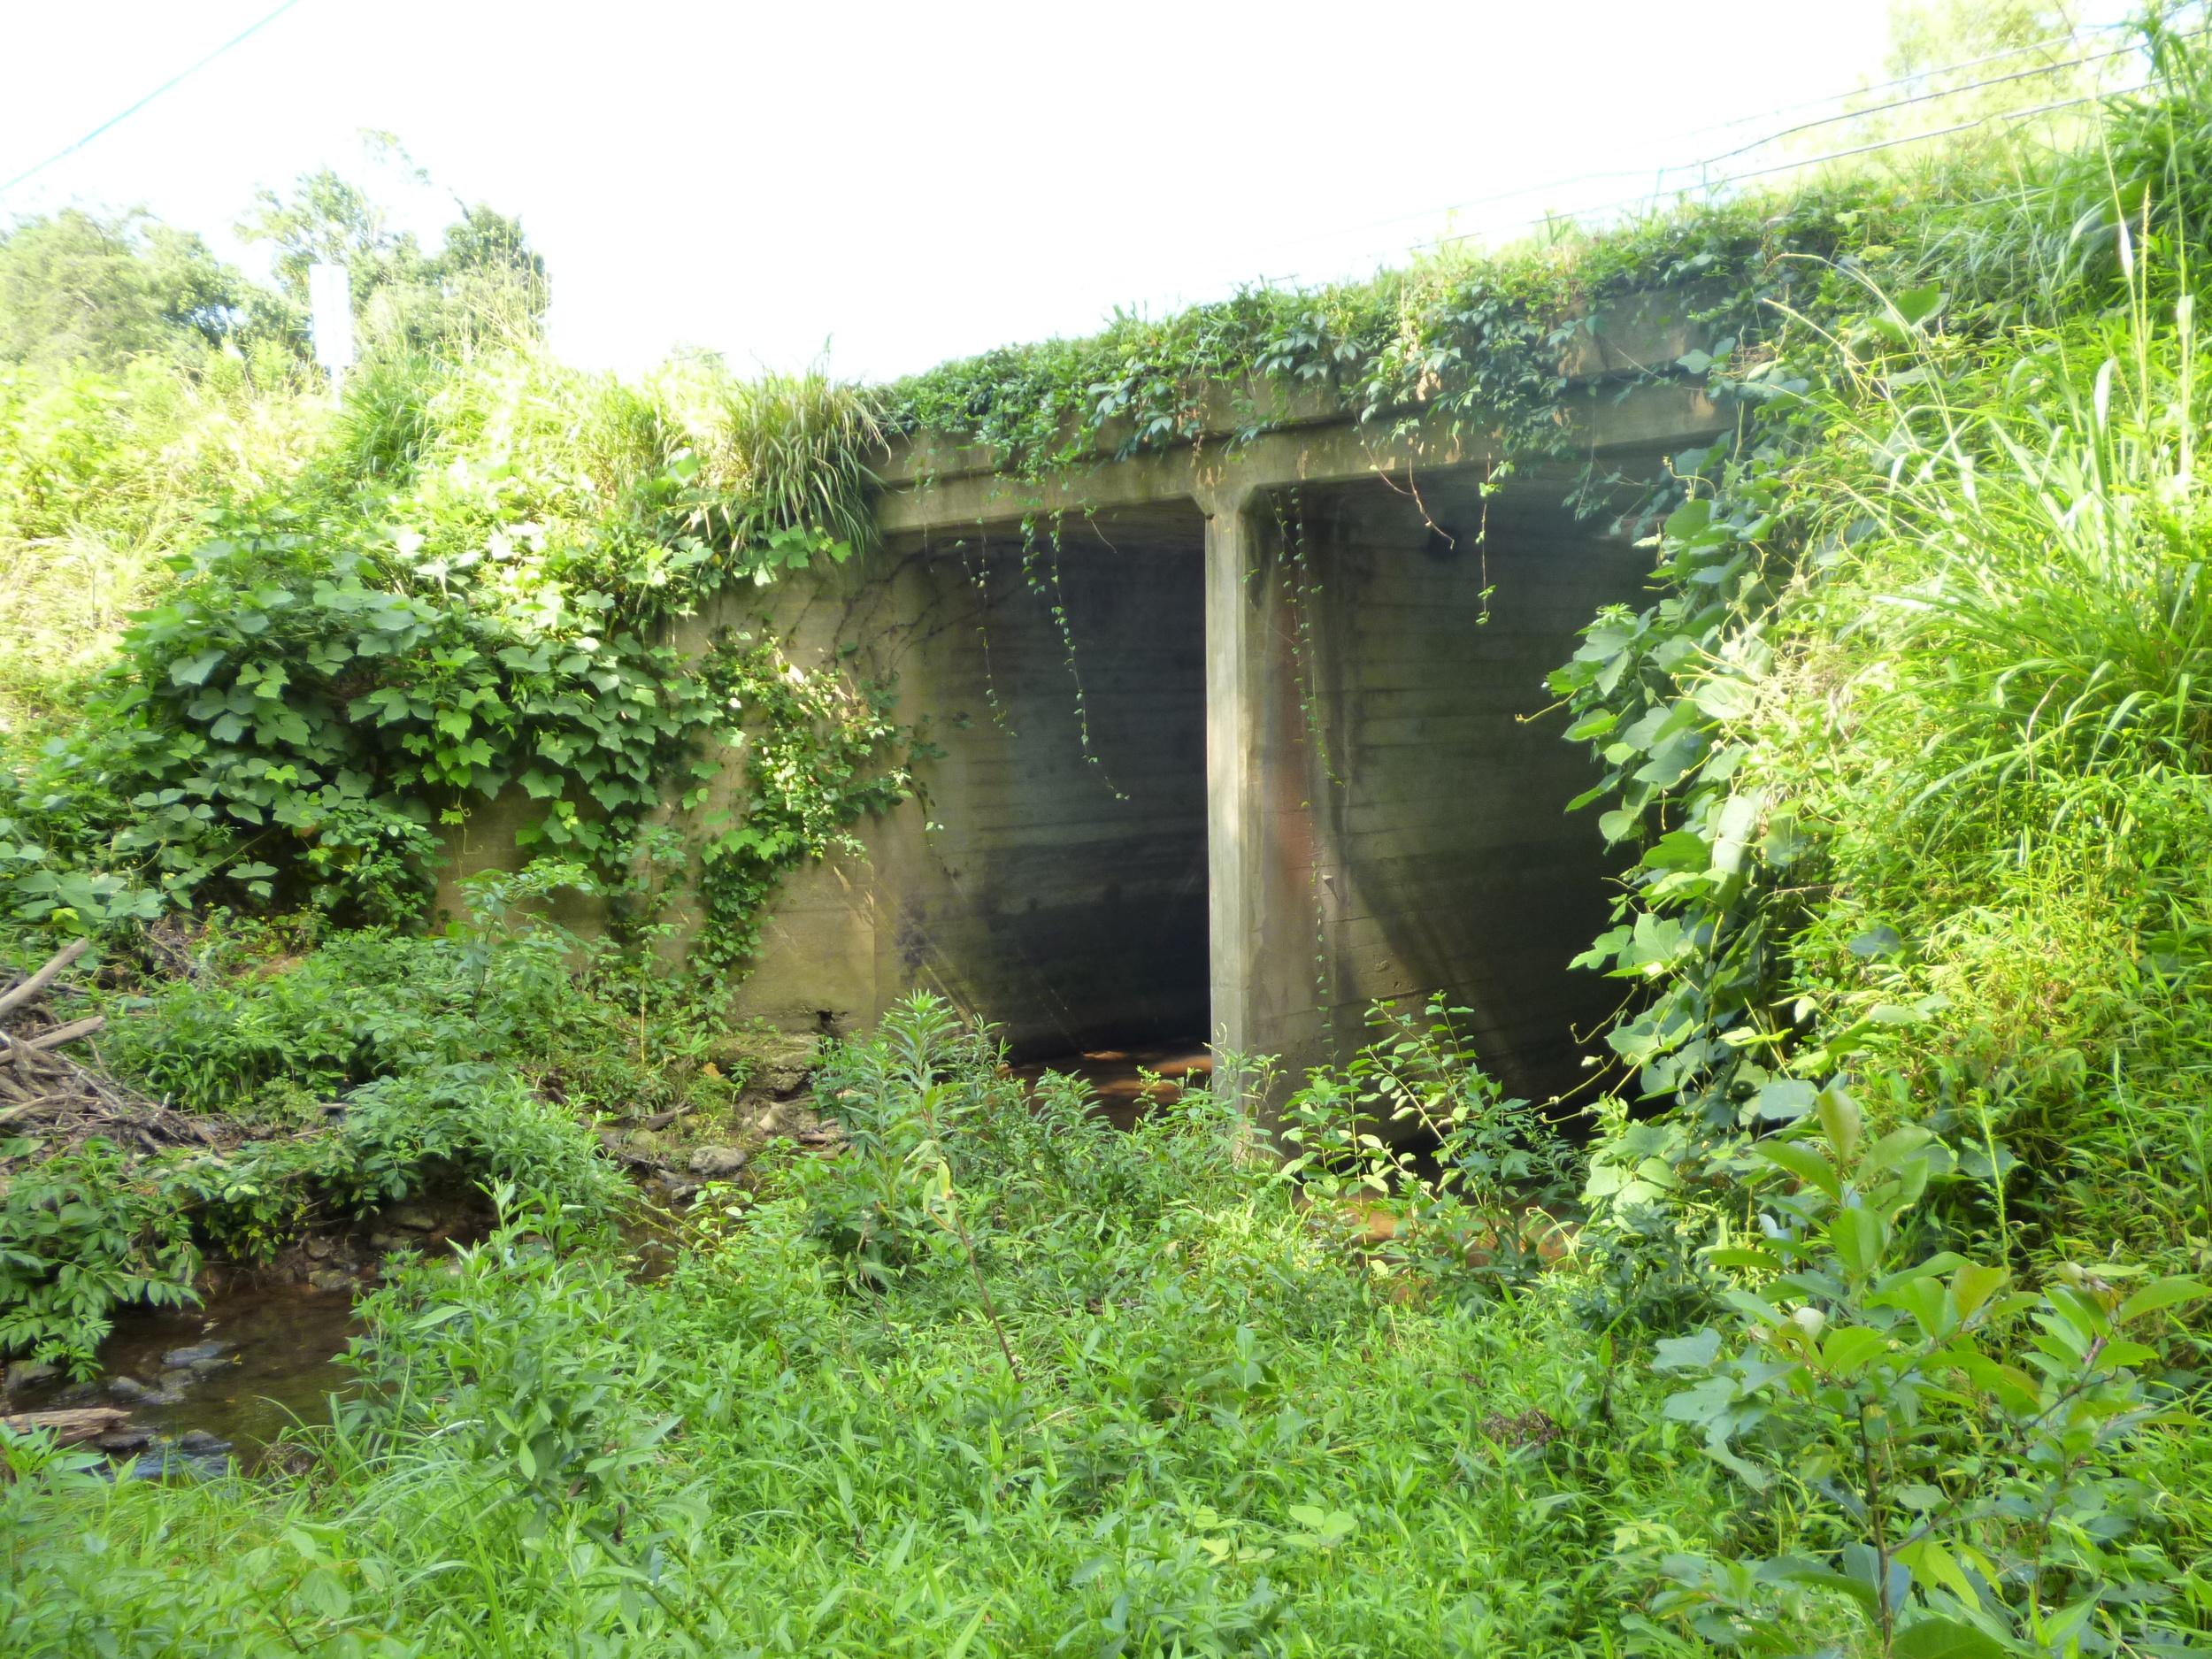 Reinforced concrete box culvert downstream of Bridge 00207